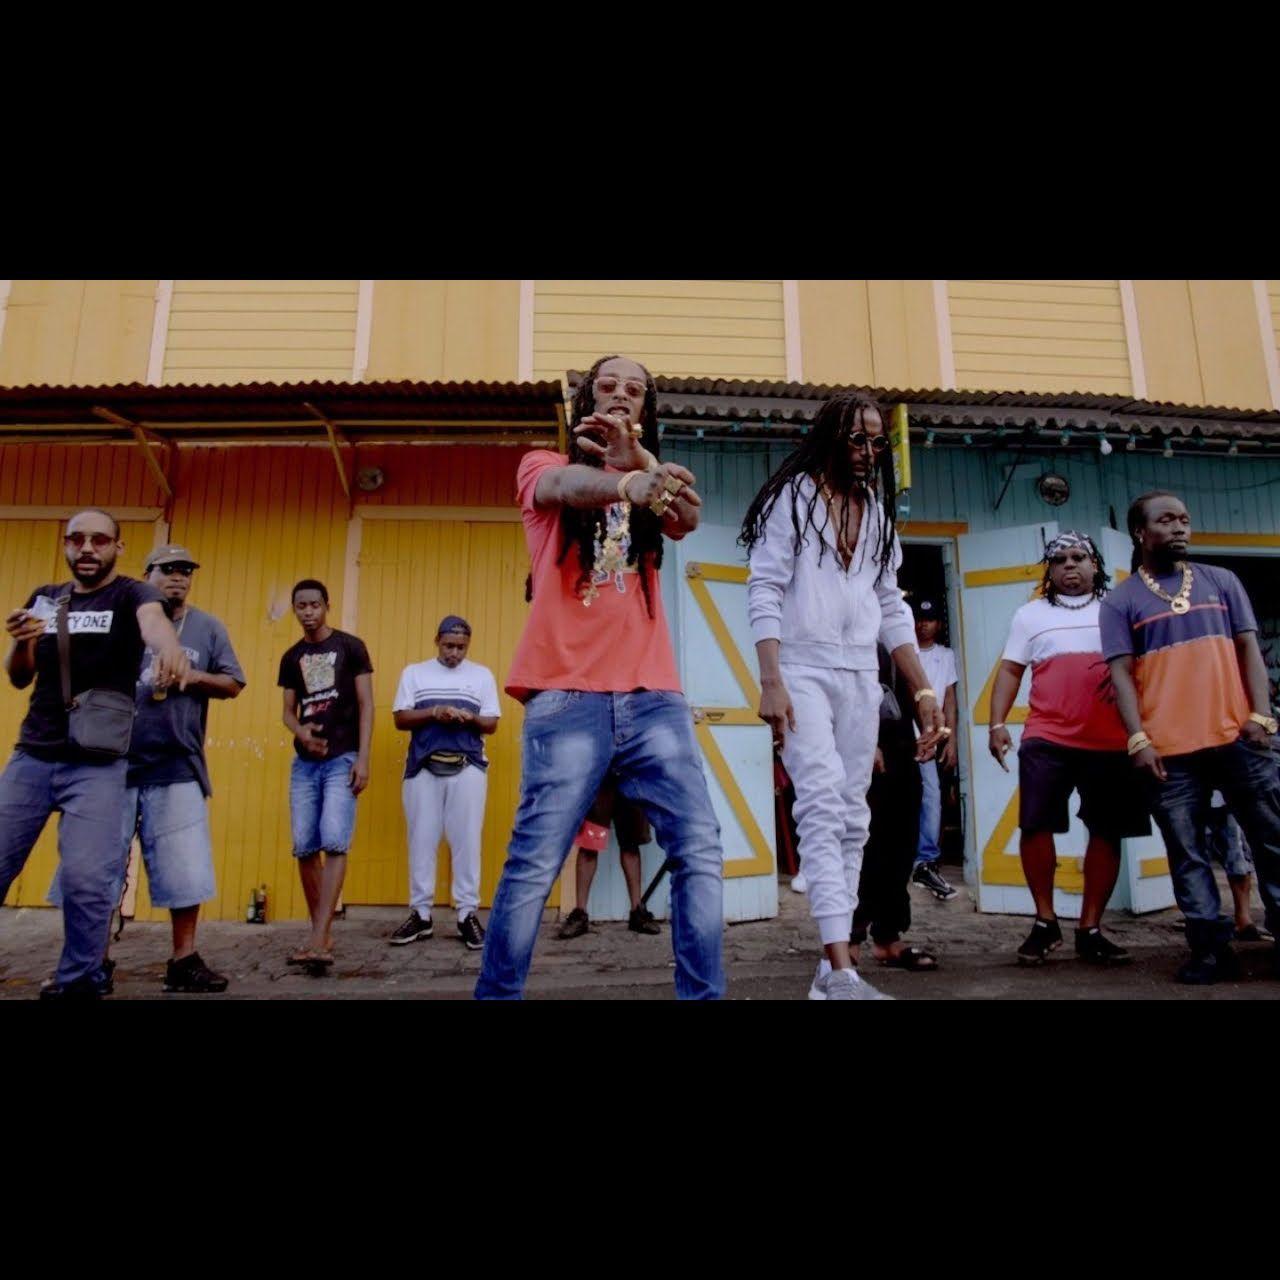 Keros-N - Ça ira (ft. Don Snoop) (Thumbnail)